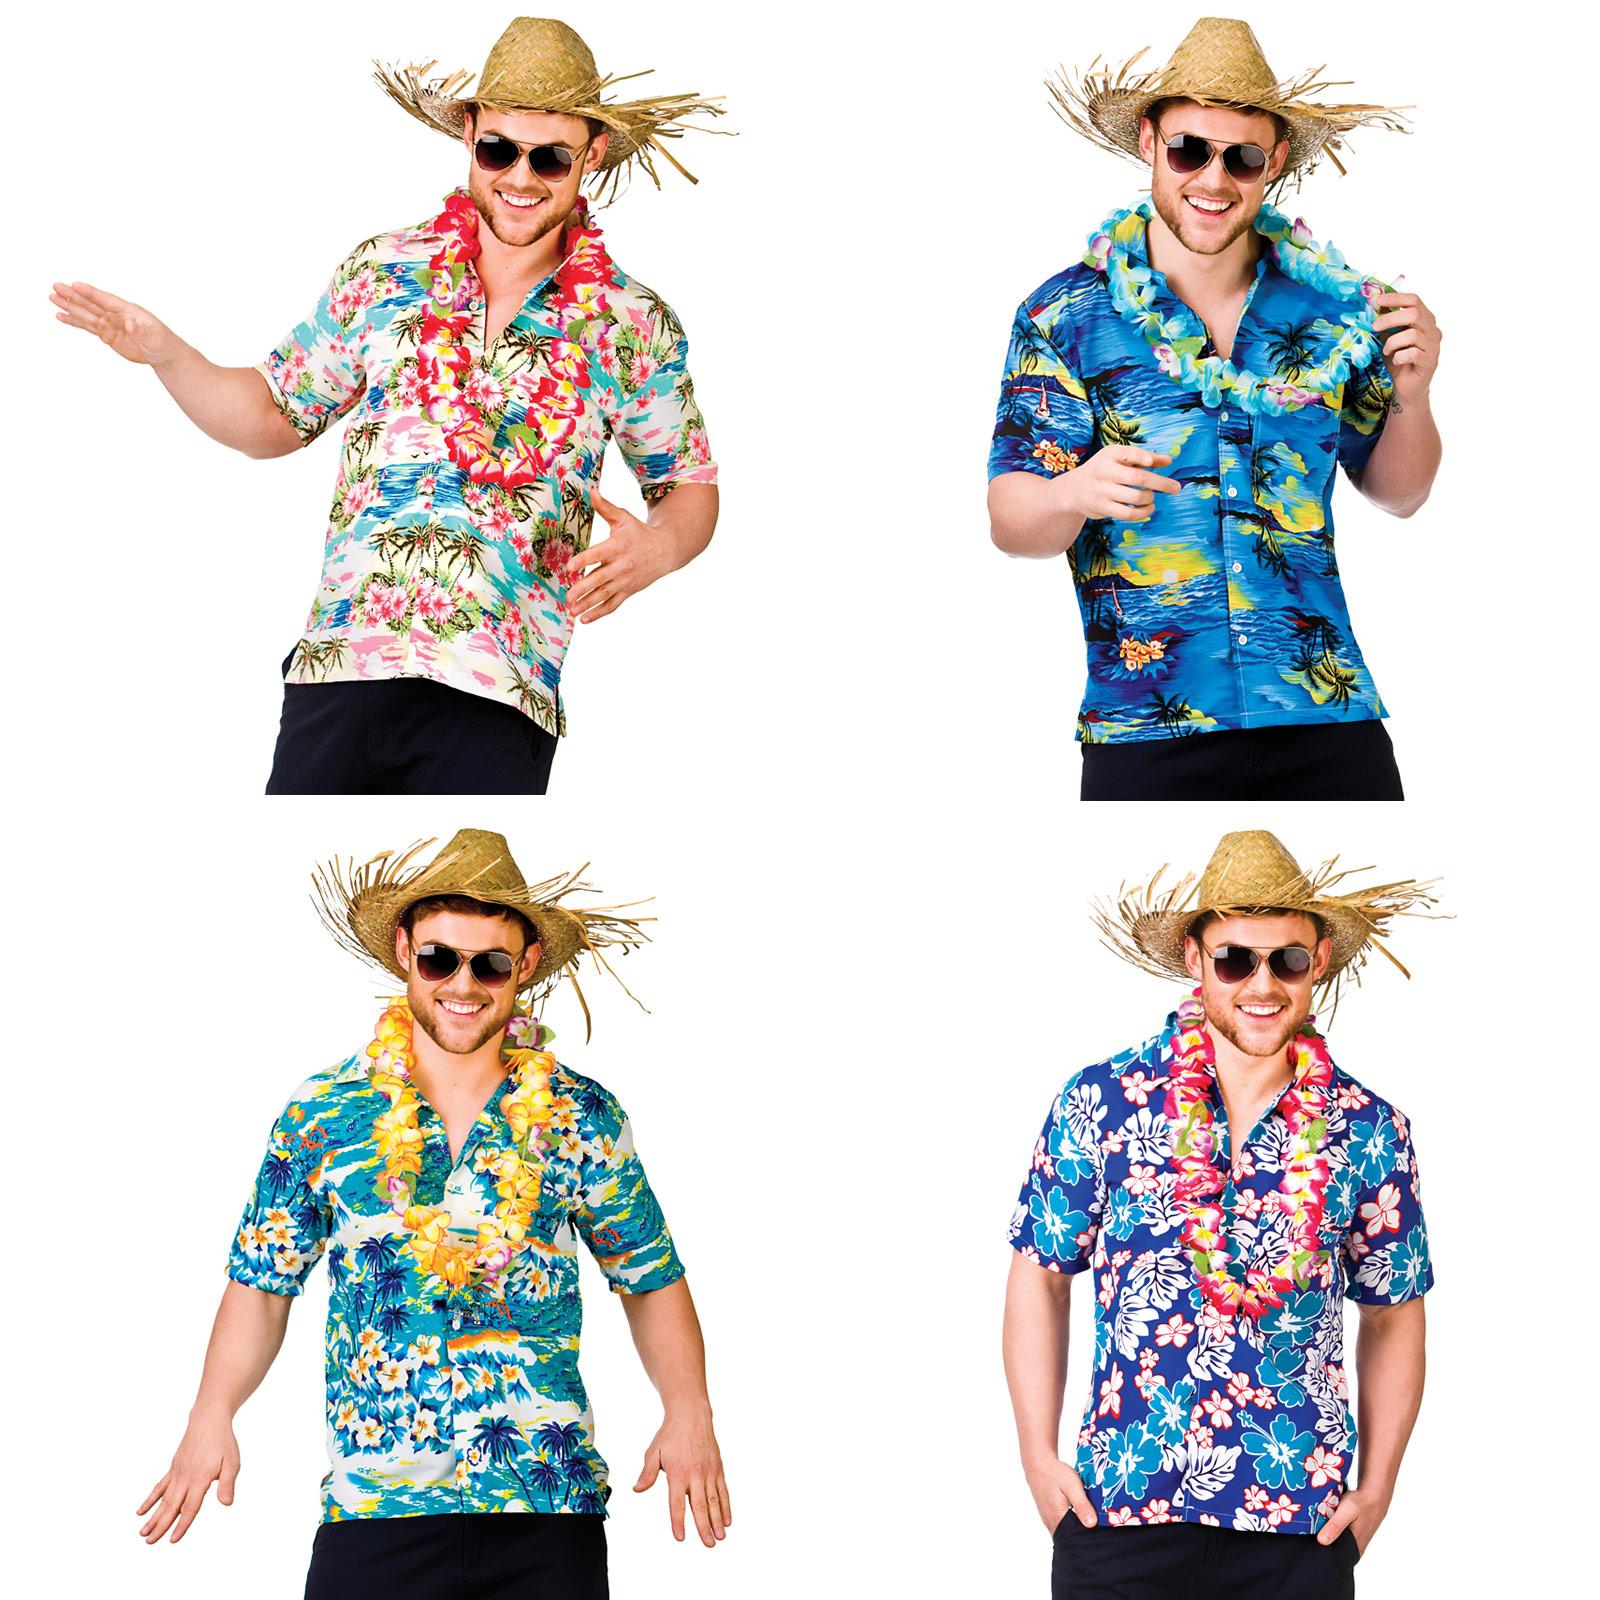 Luau Hawaii Shirt Fancy Dress Beach BBQ Barbecue Summer Party Top